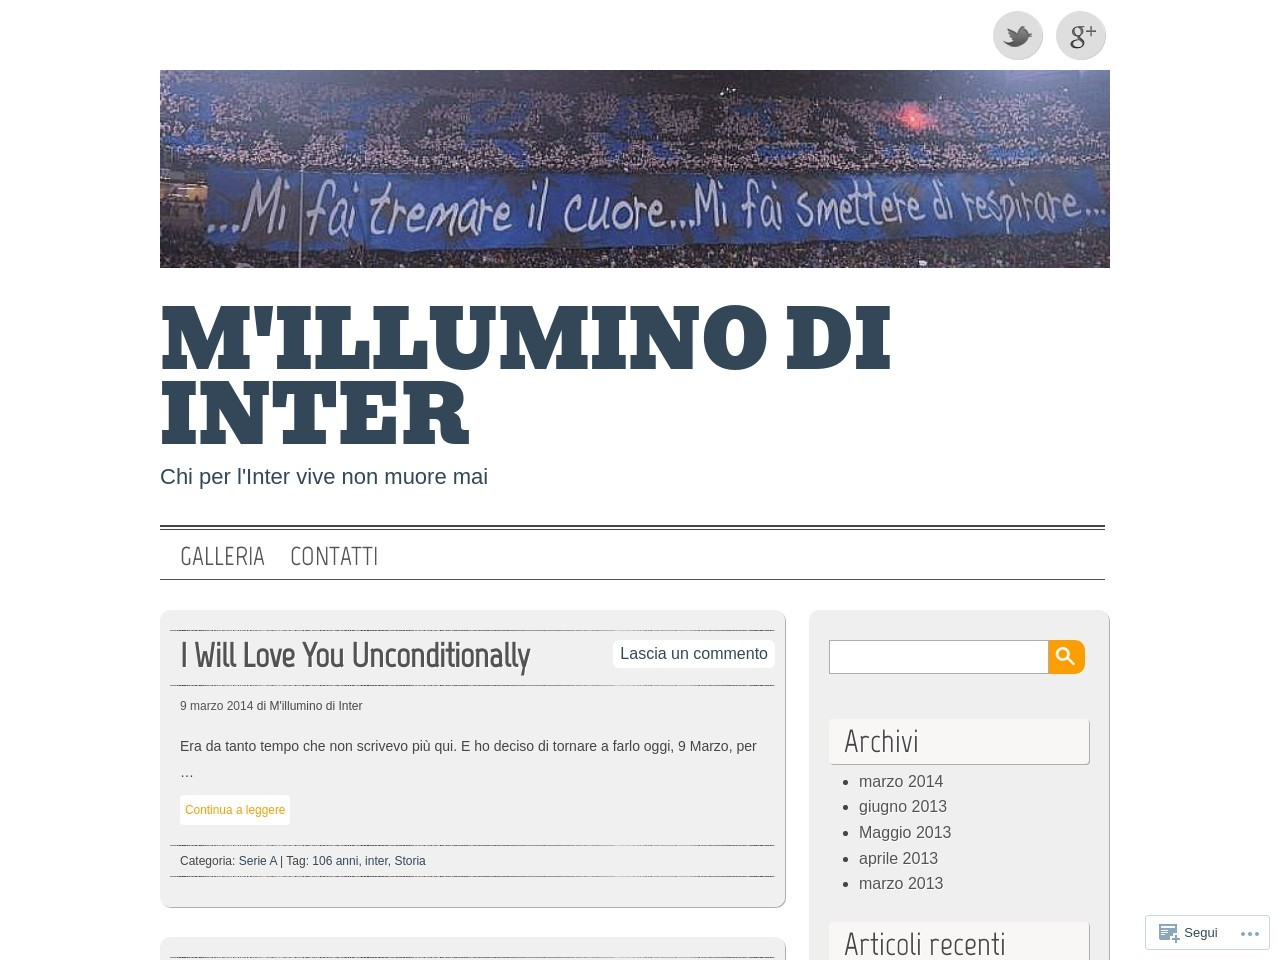 millumino-di-inter